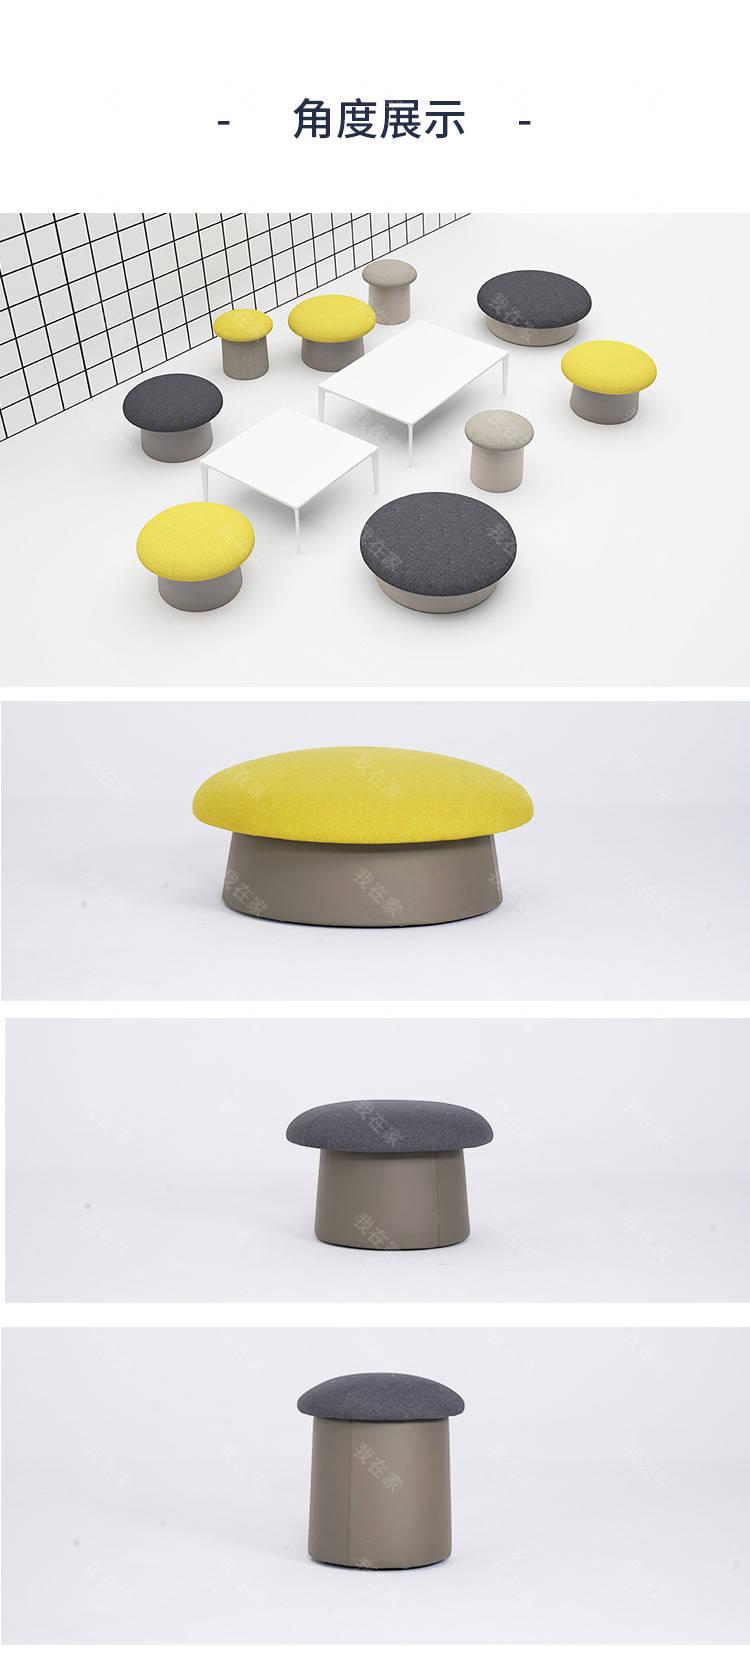 WINK品牌蘑菇墩的详细介绍